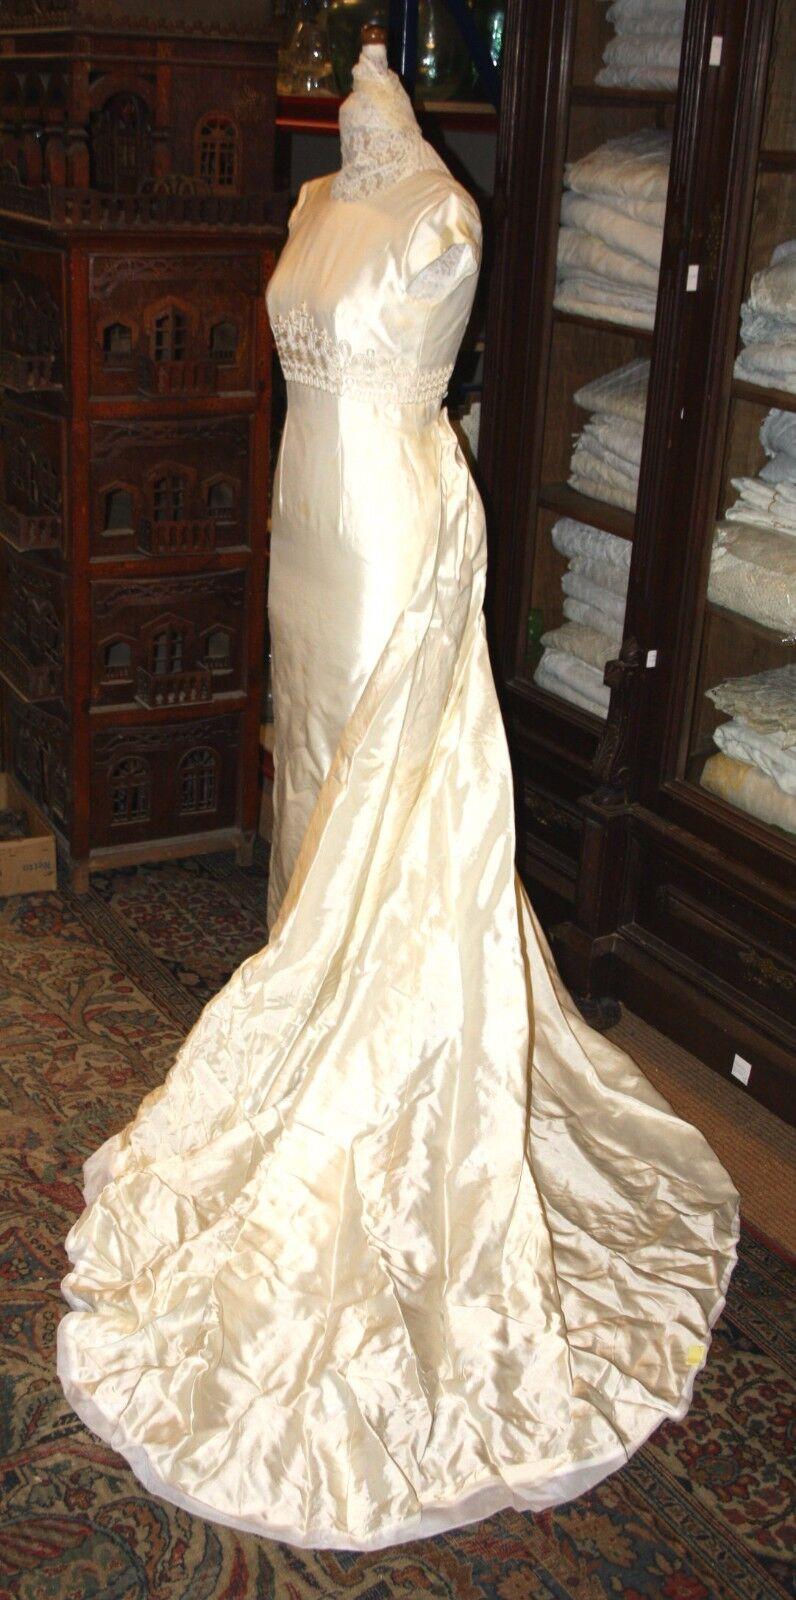 DRESS VOVIA PRONOVIAS. SILK COLOR CHAMPAGNE. SPAIN. TWENTIETH CENTURY.